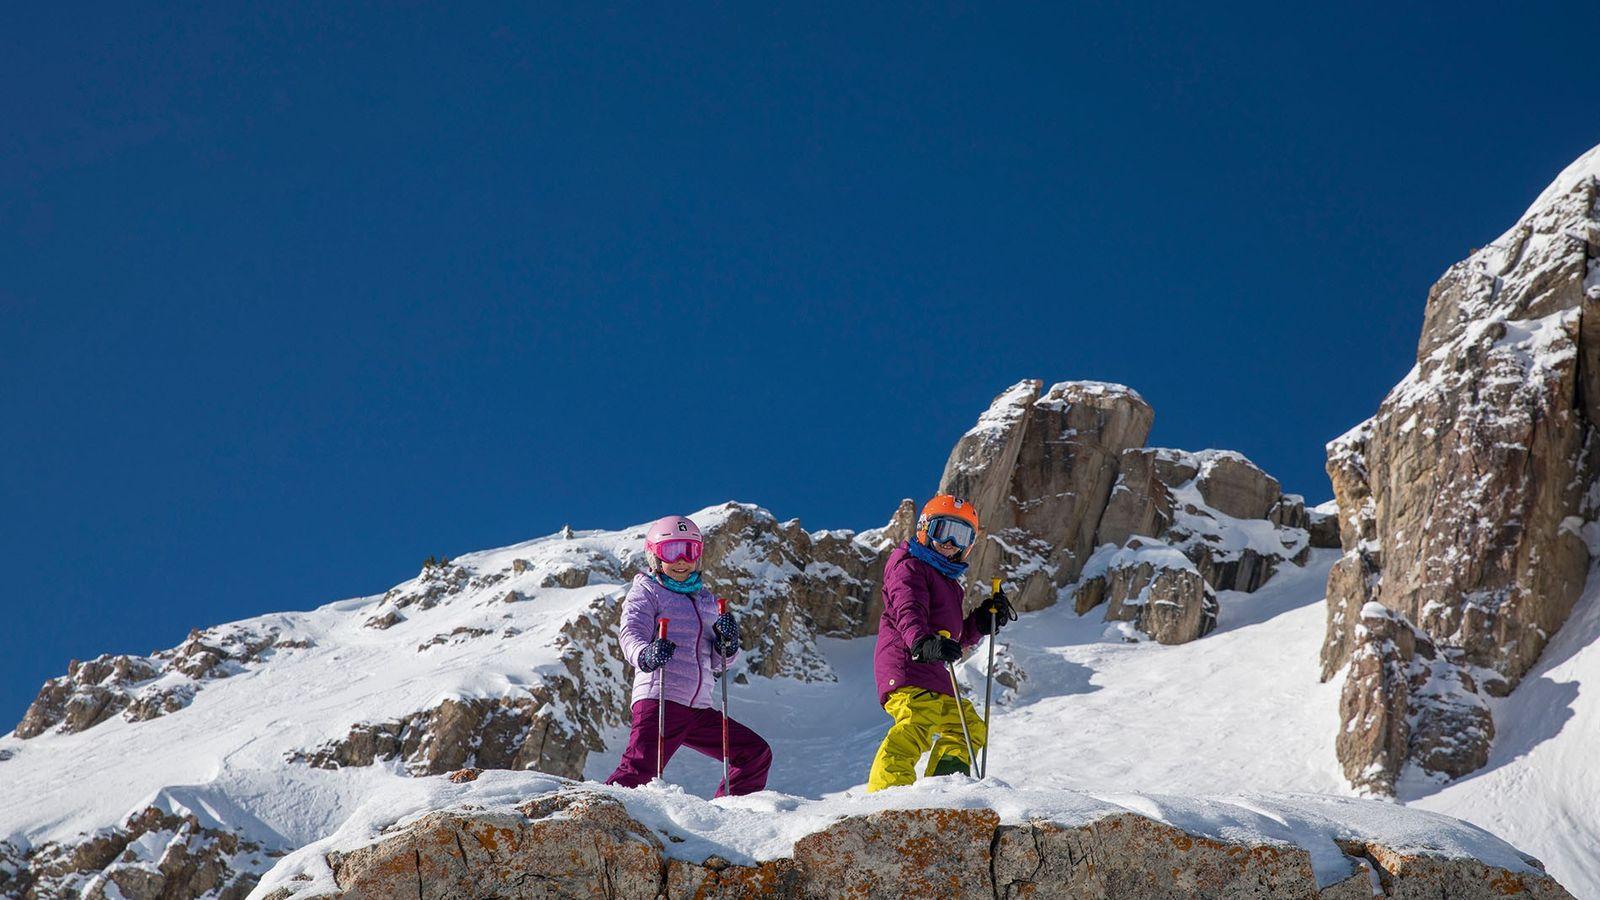 Children skiing on mountainside